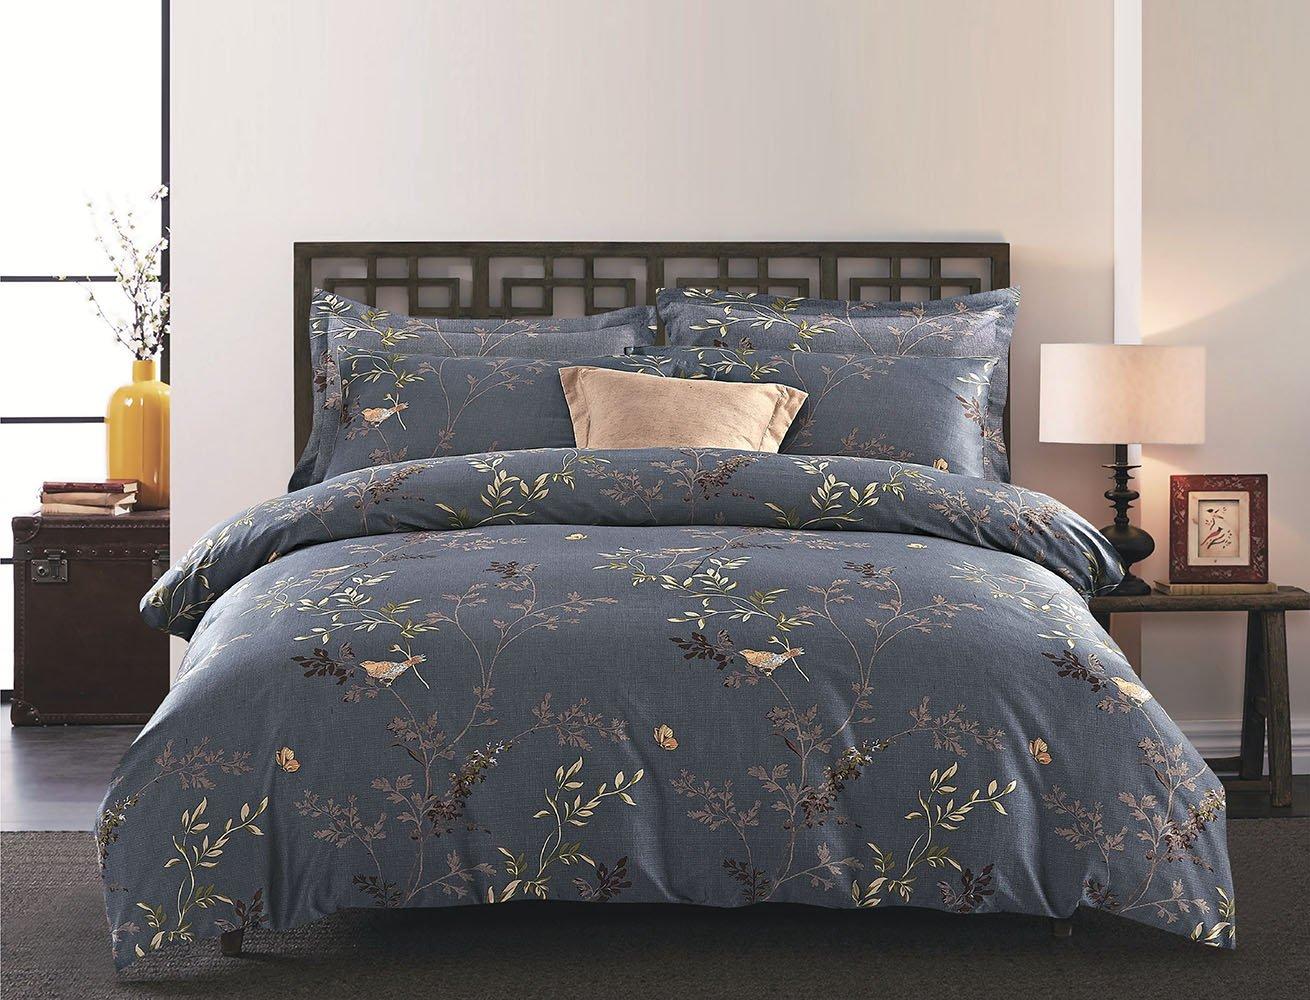 Wake In Cloud 3pcs Gray Comforter Set King, Birds Floral Flowers Leaves Pattern Printed On Dark Grey, Soft Microfiber Bedding (King Size)